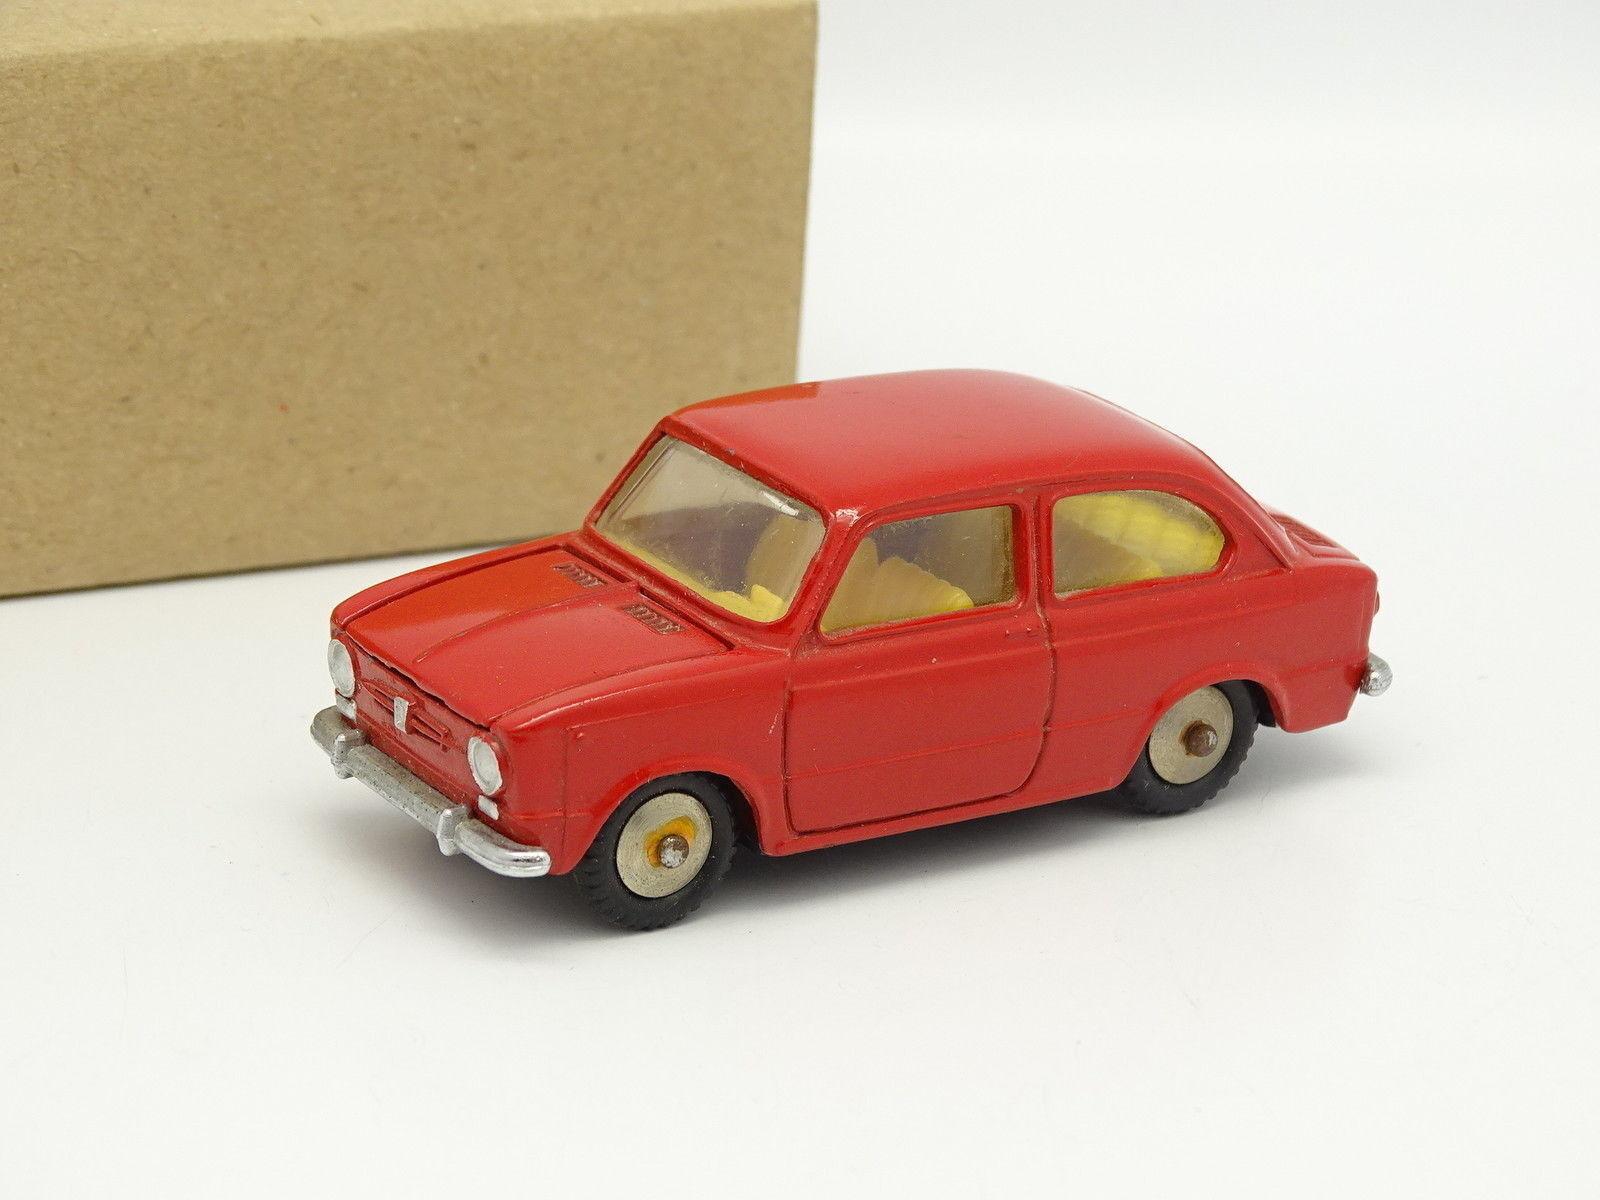 Mercury Mercury Mercury 1 43 - Fiat 850 red ba0840